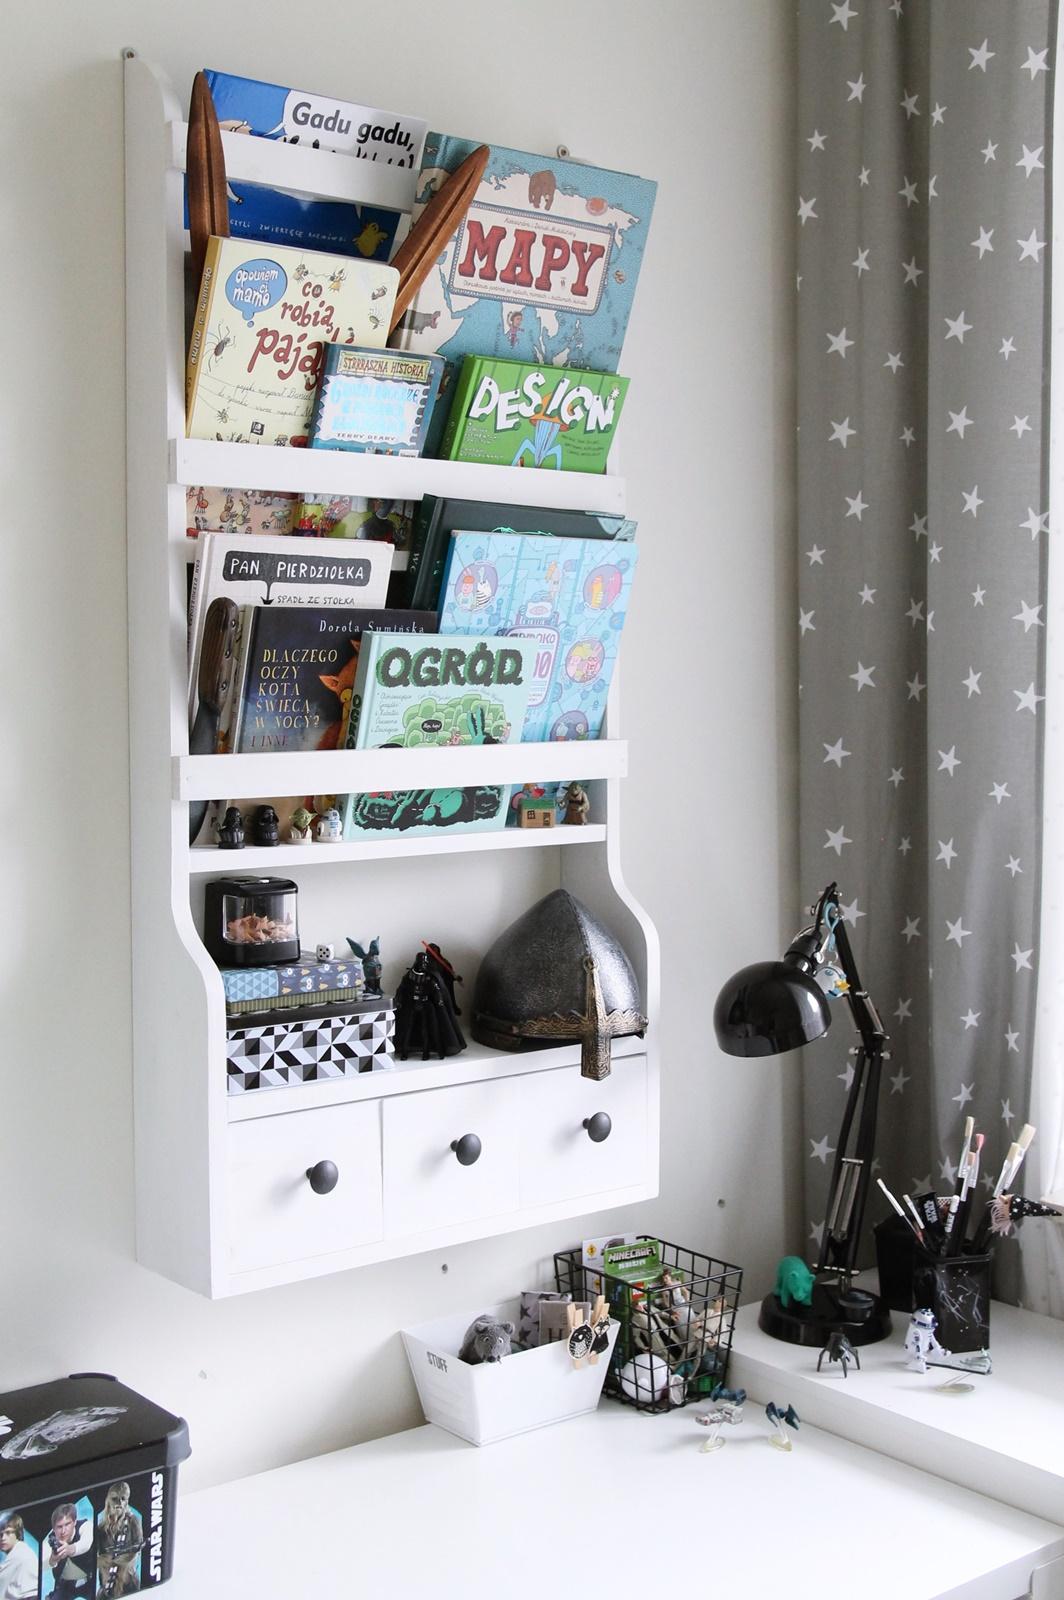 Scndi bookshelf